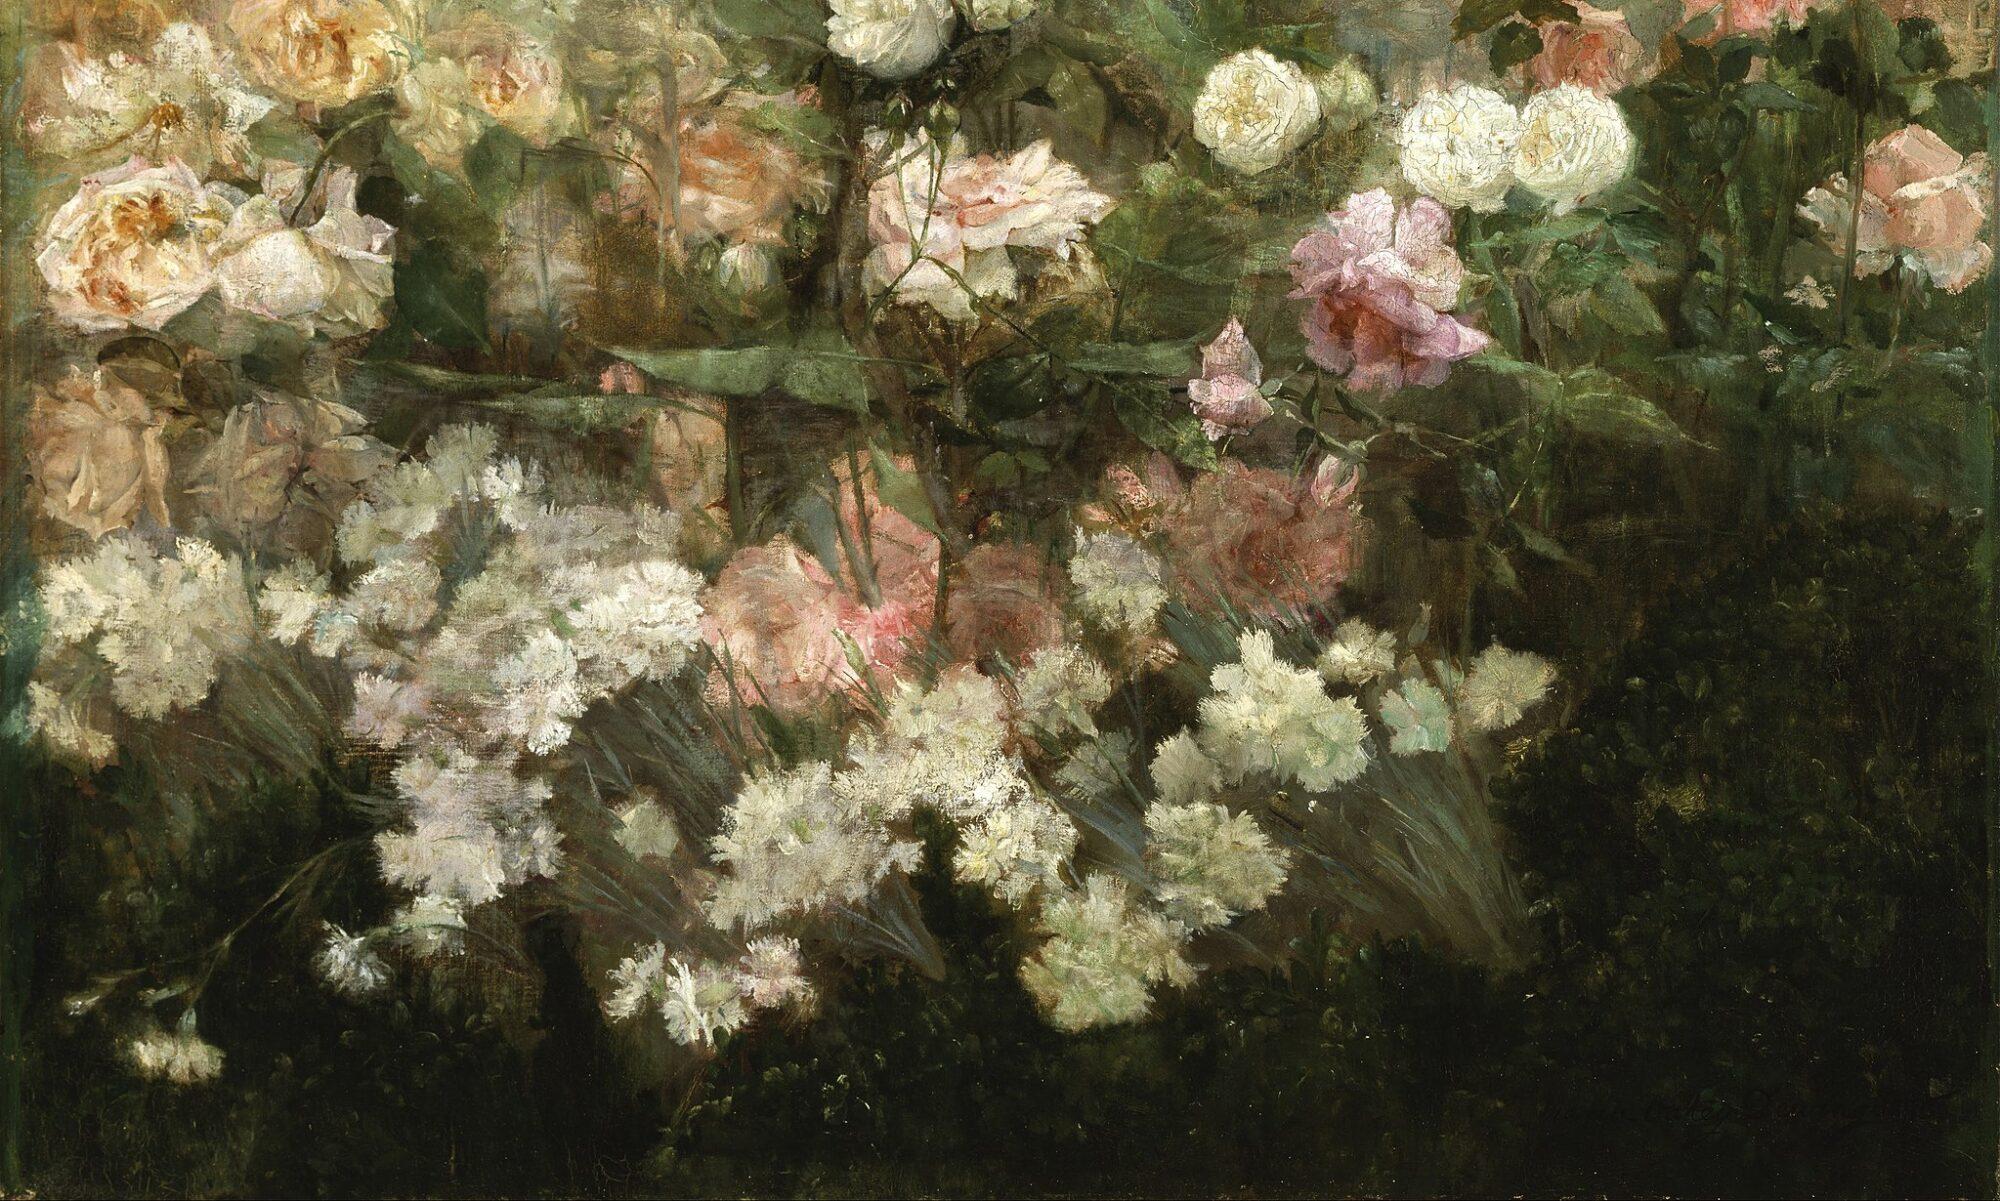 Susanna Ives' Floating World